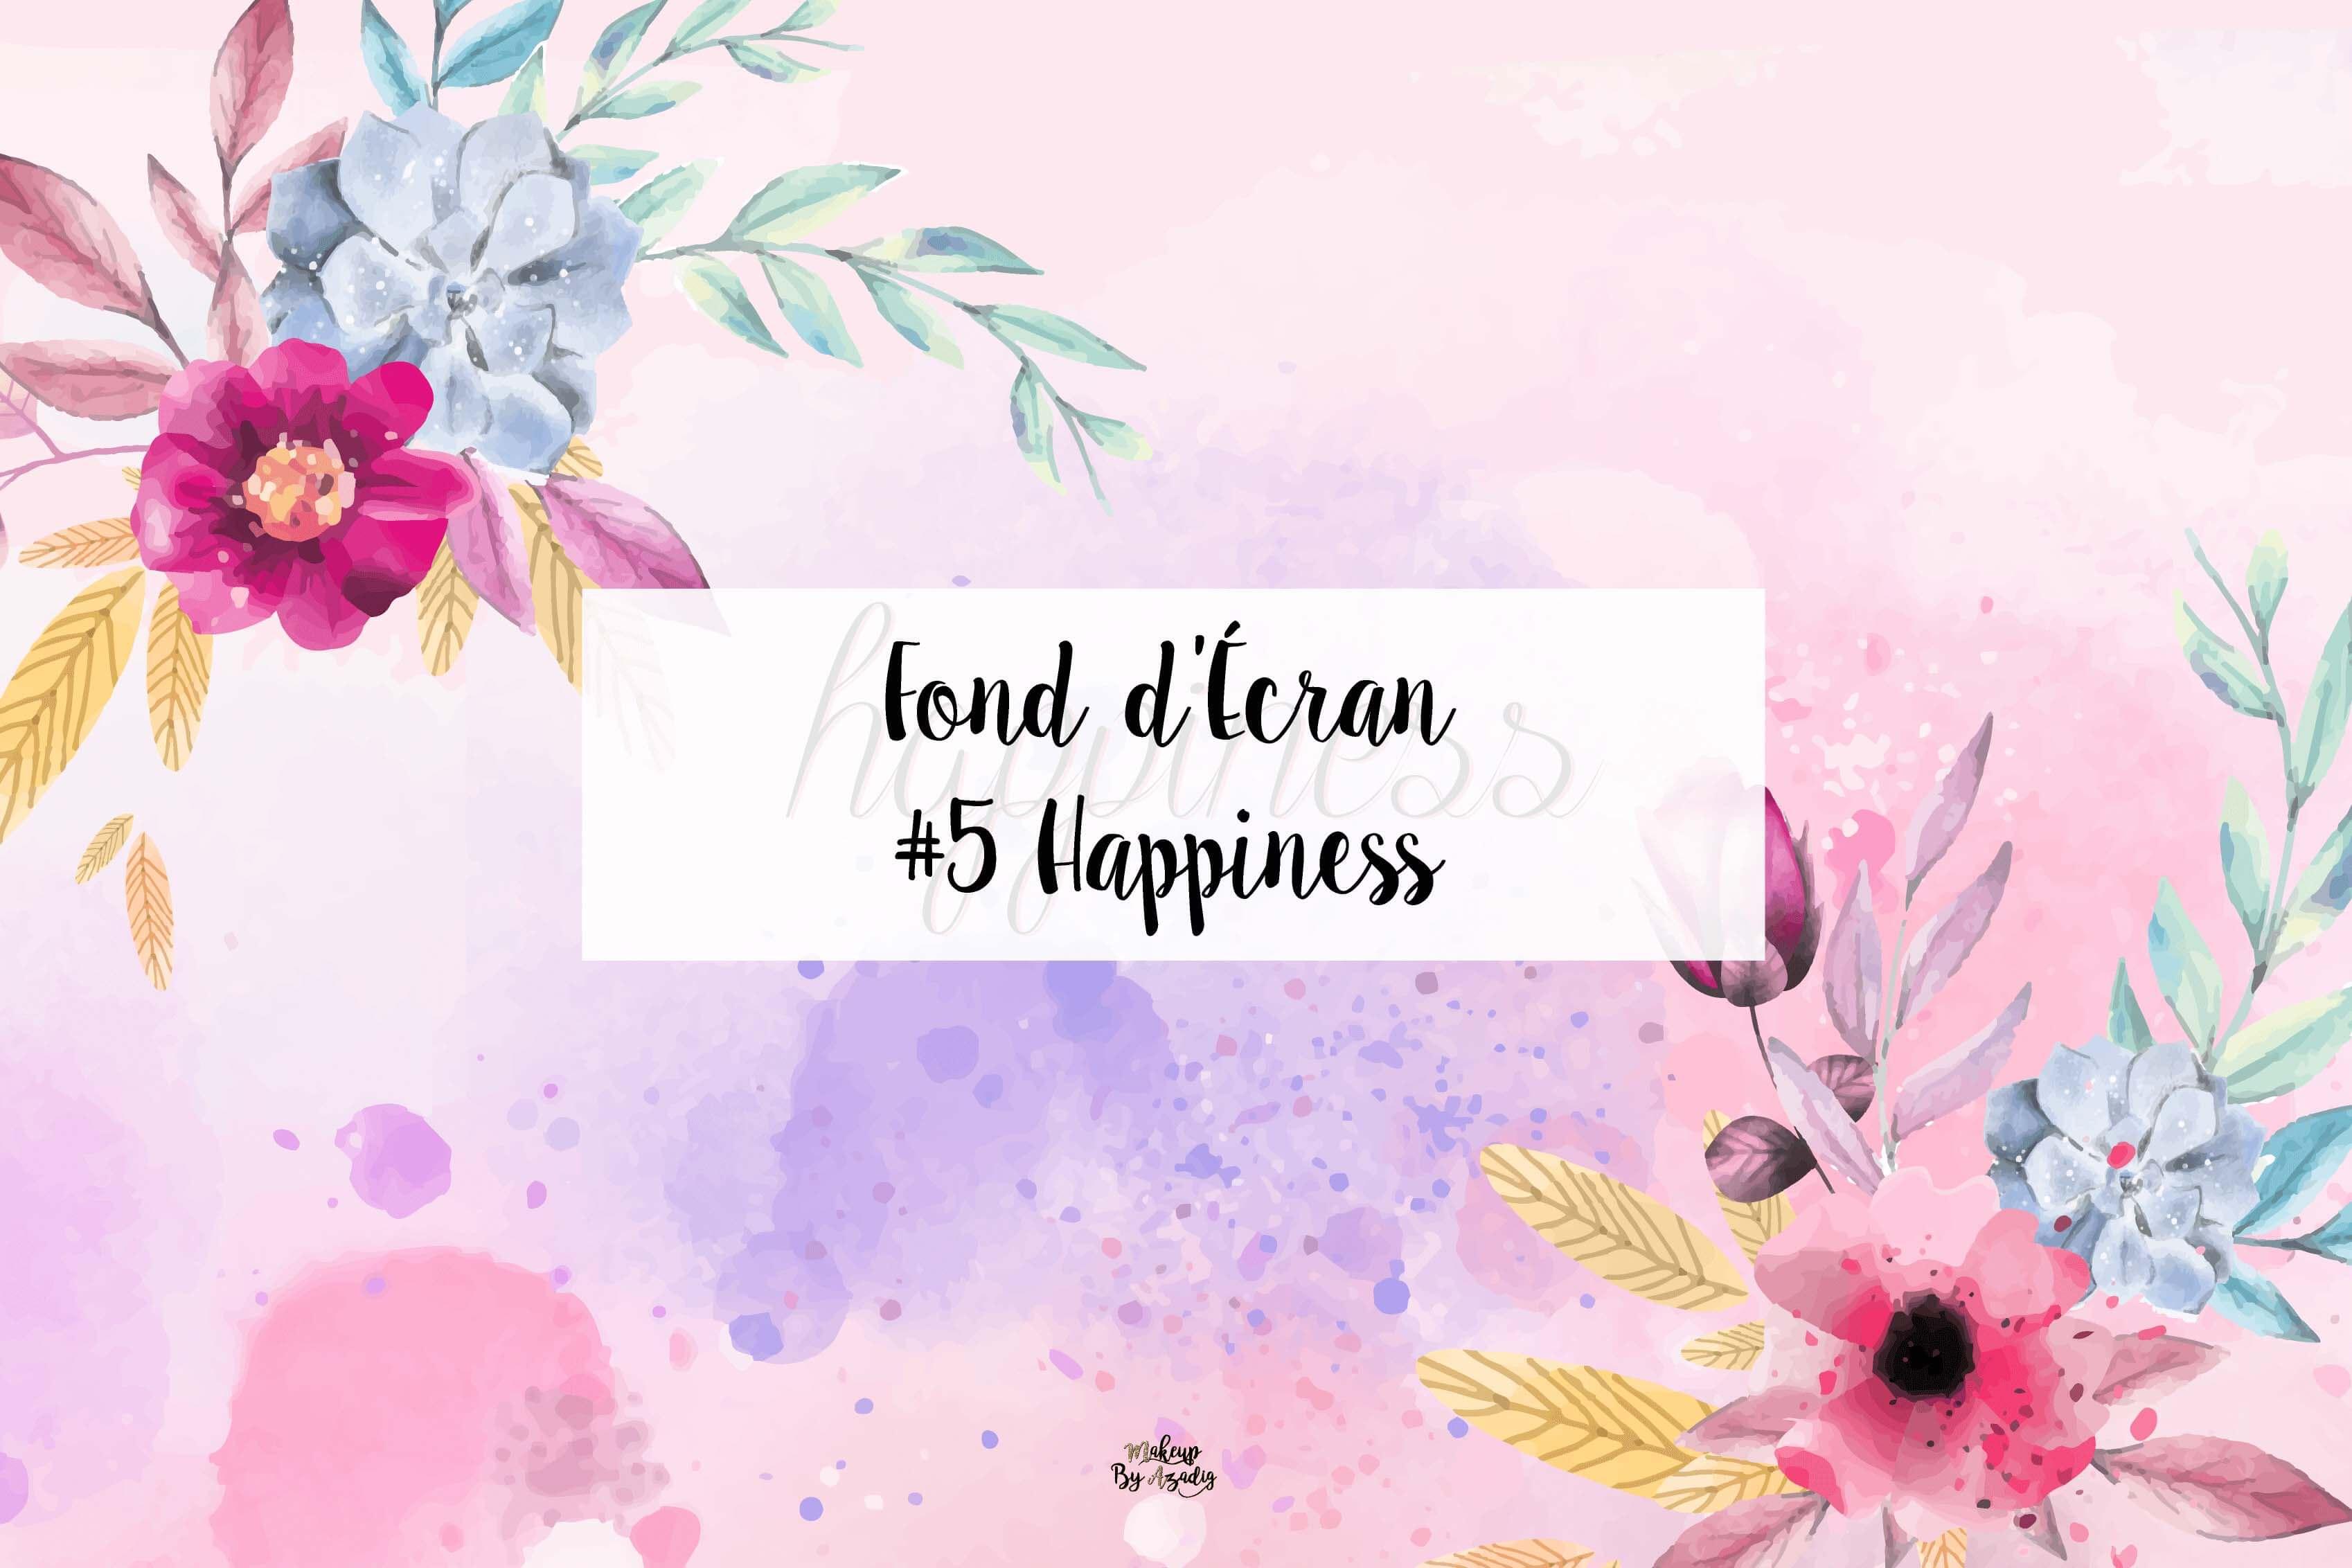 fond-decran-wallpaper-happiness-bonheur-joie-ordinateur-iphone-samsung-mac-macbook-imac-pc-makeupbyazadig-tendance